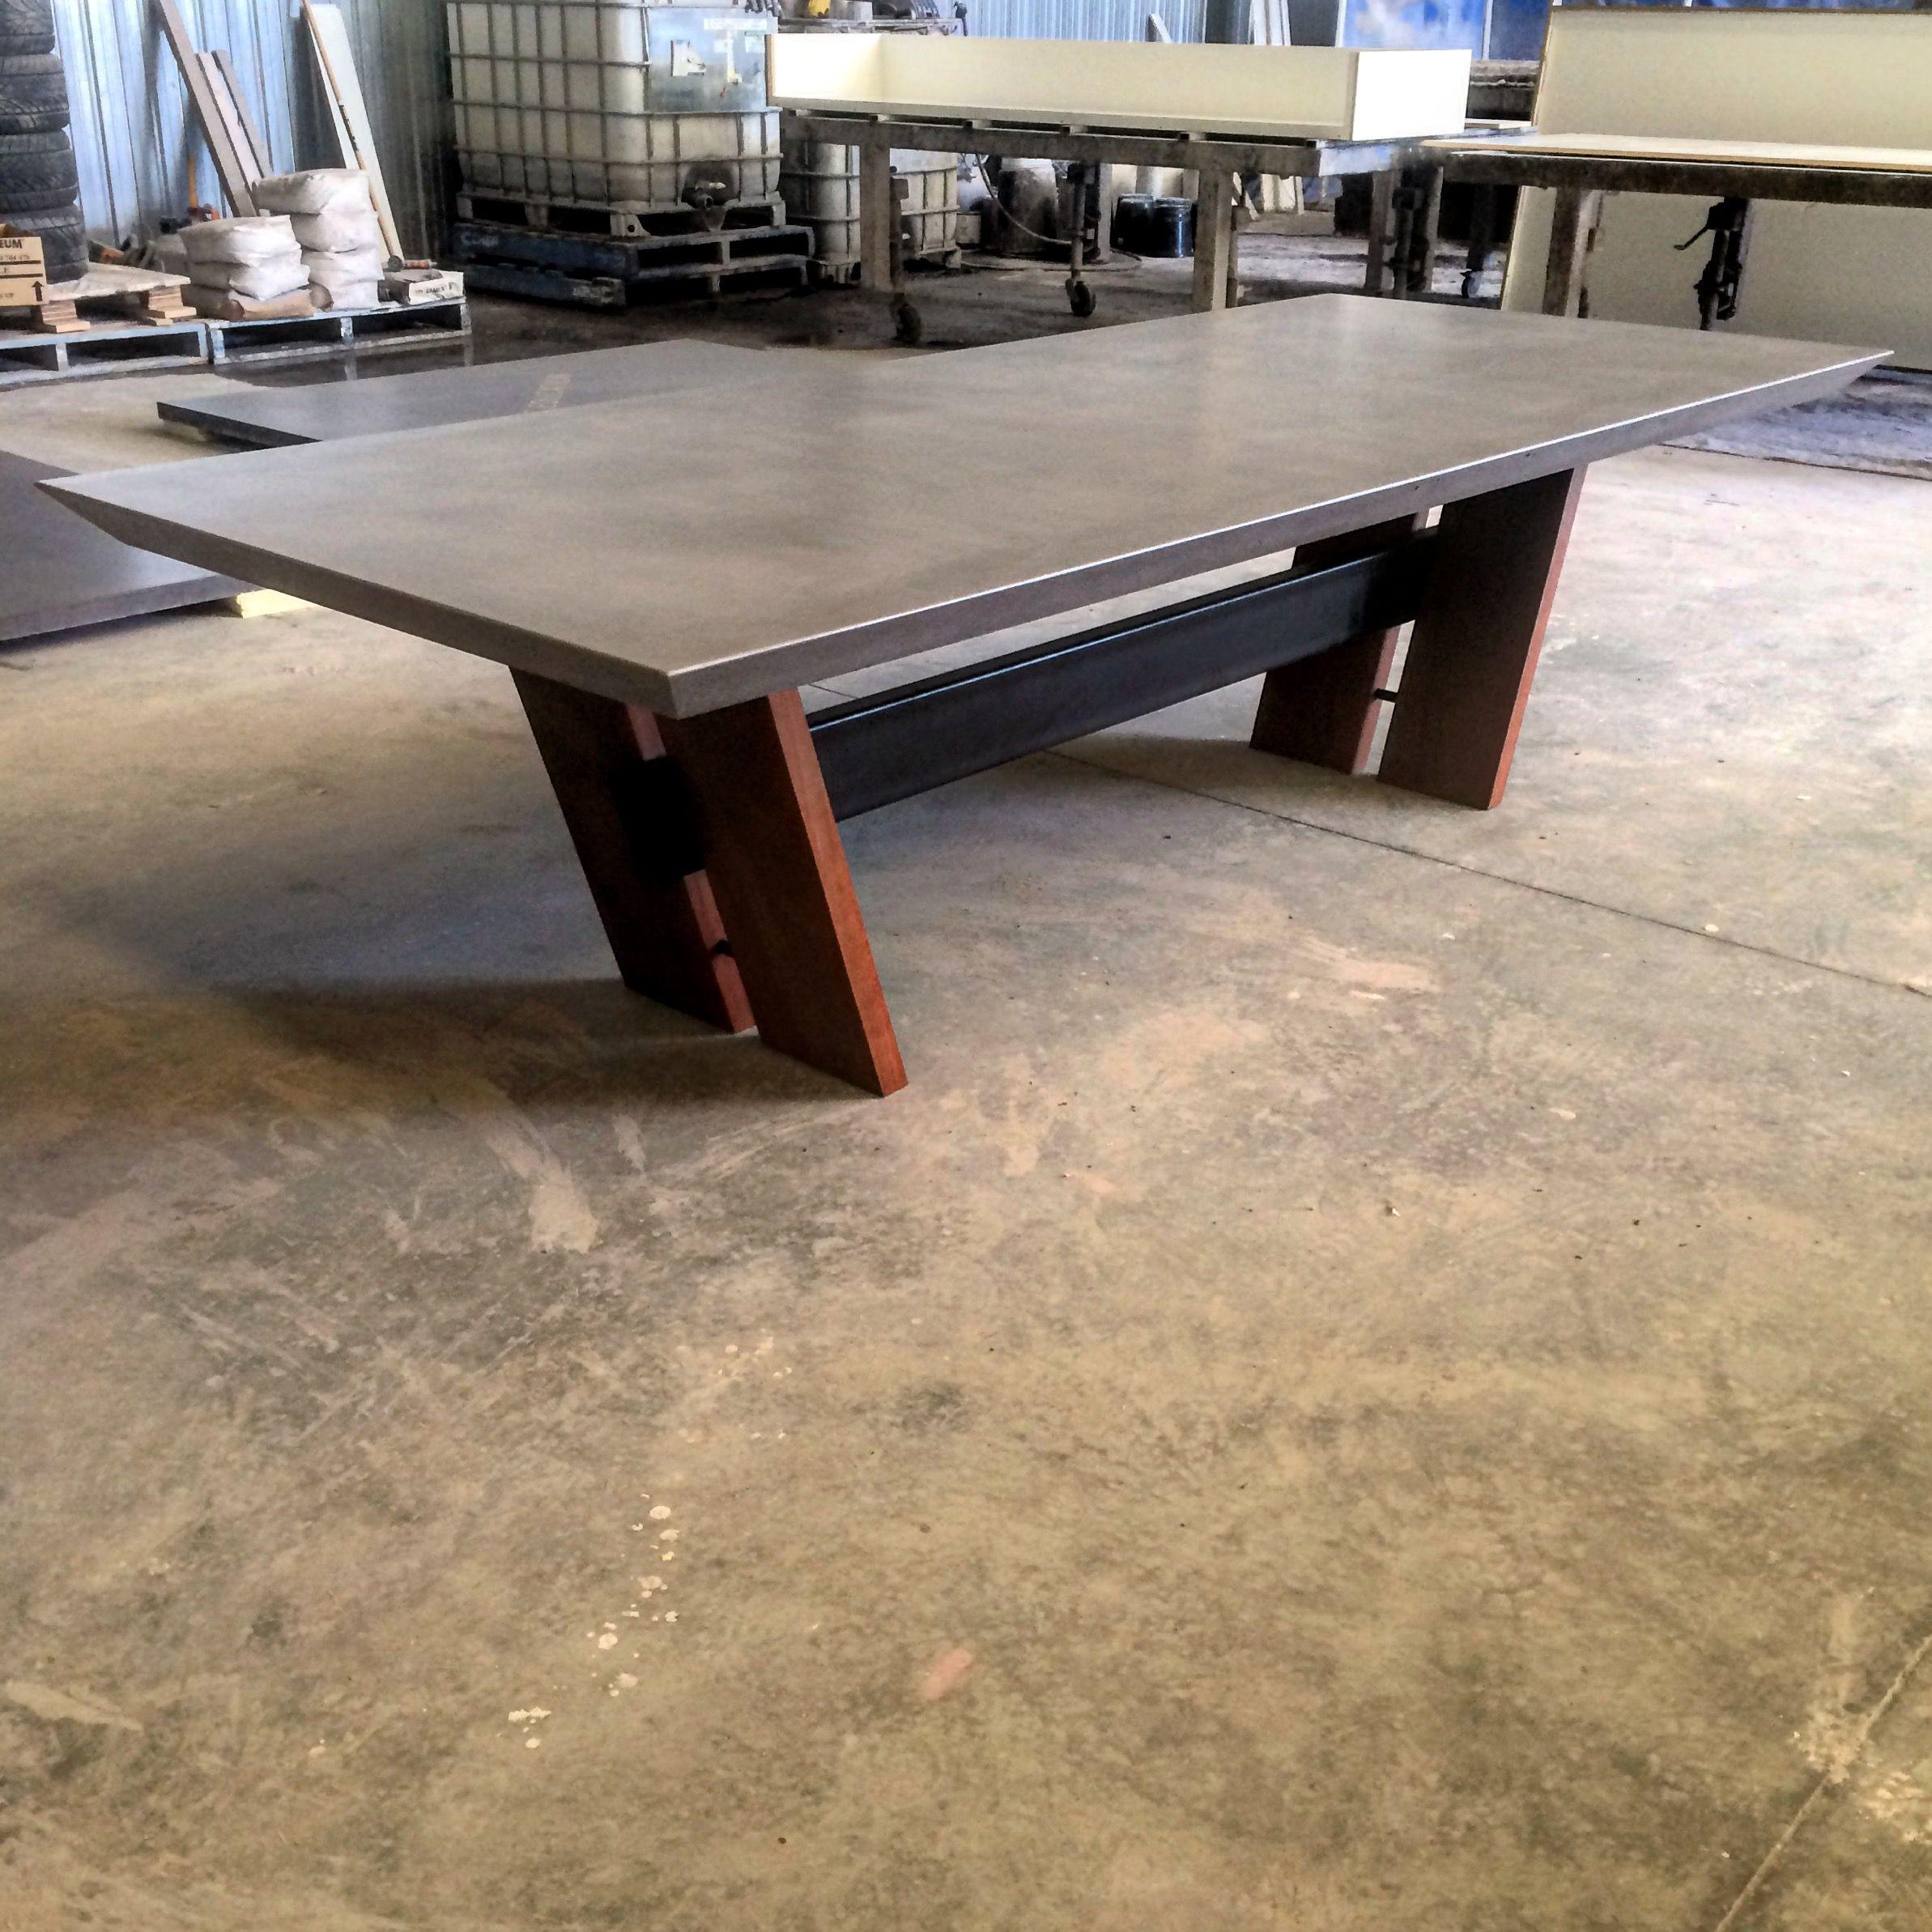 Polished Concrete Table By Mitchell Bink Concrete Design.   Concrete  Furniture   Pinterest   Concrete Table, Polished Concrete And Concrete  Design